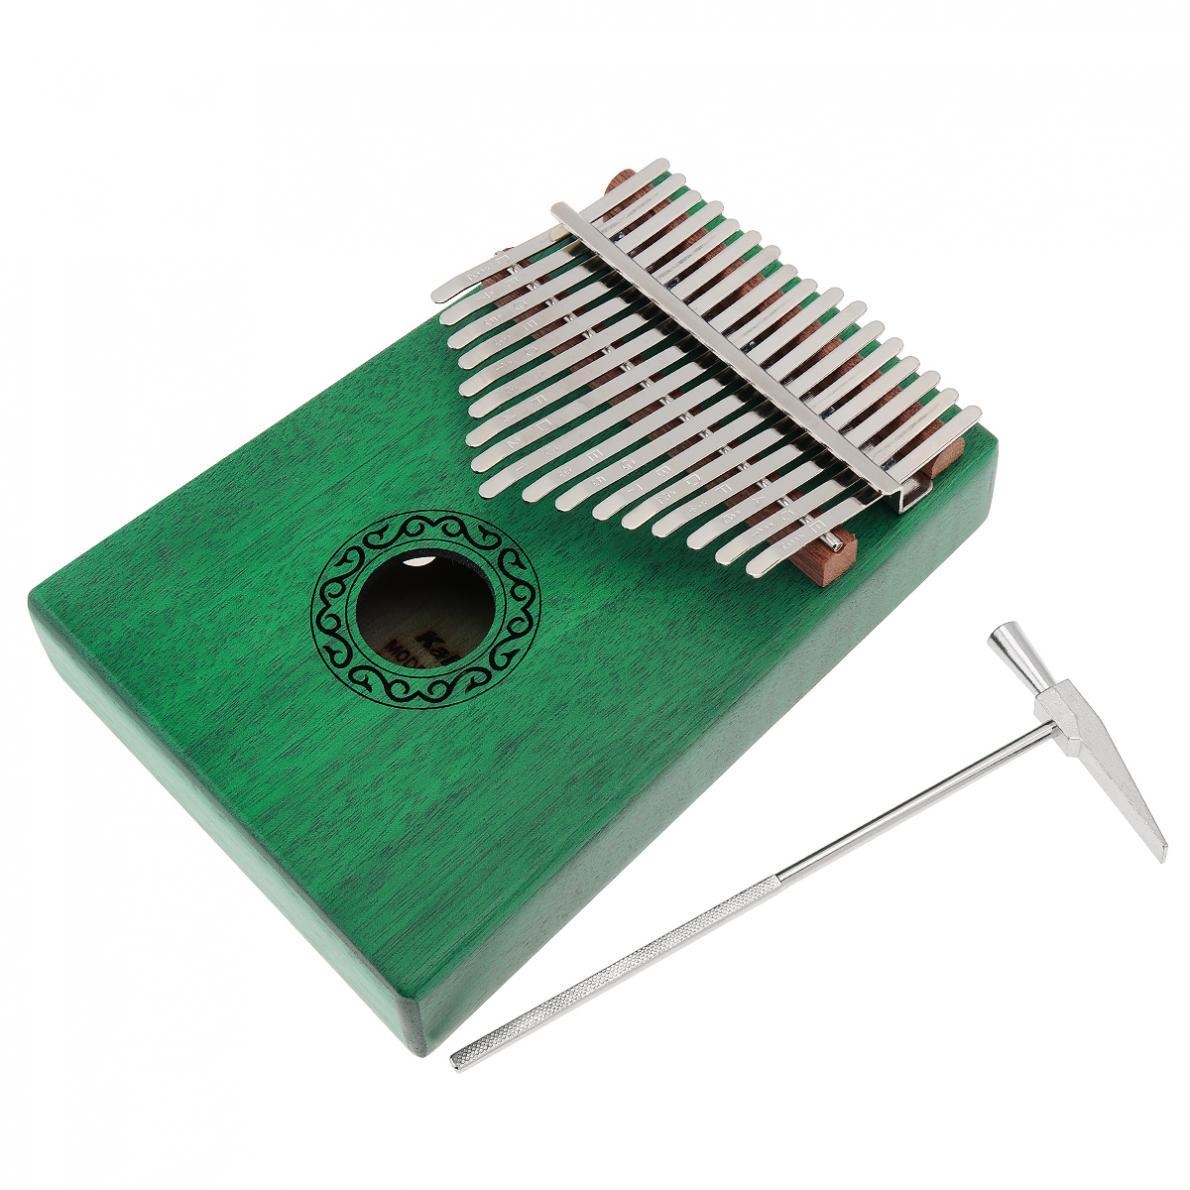 Thumb Piano 17 Key Green Kalimba Single Board Mahogany Thumb Piano Mbira Mini Keyboard Instrument with Complete Accessories enlarge